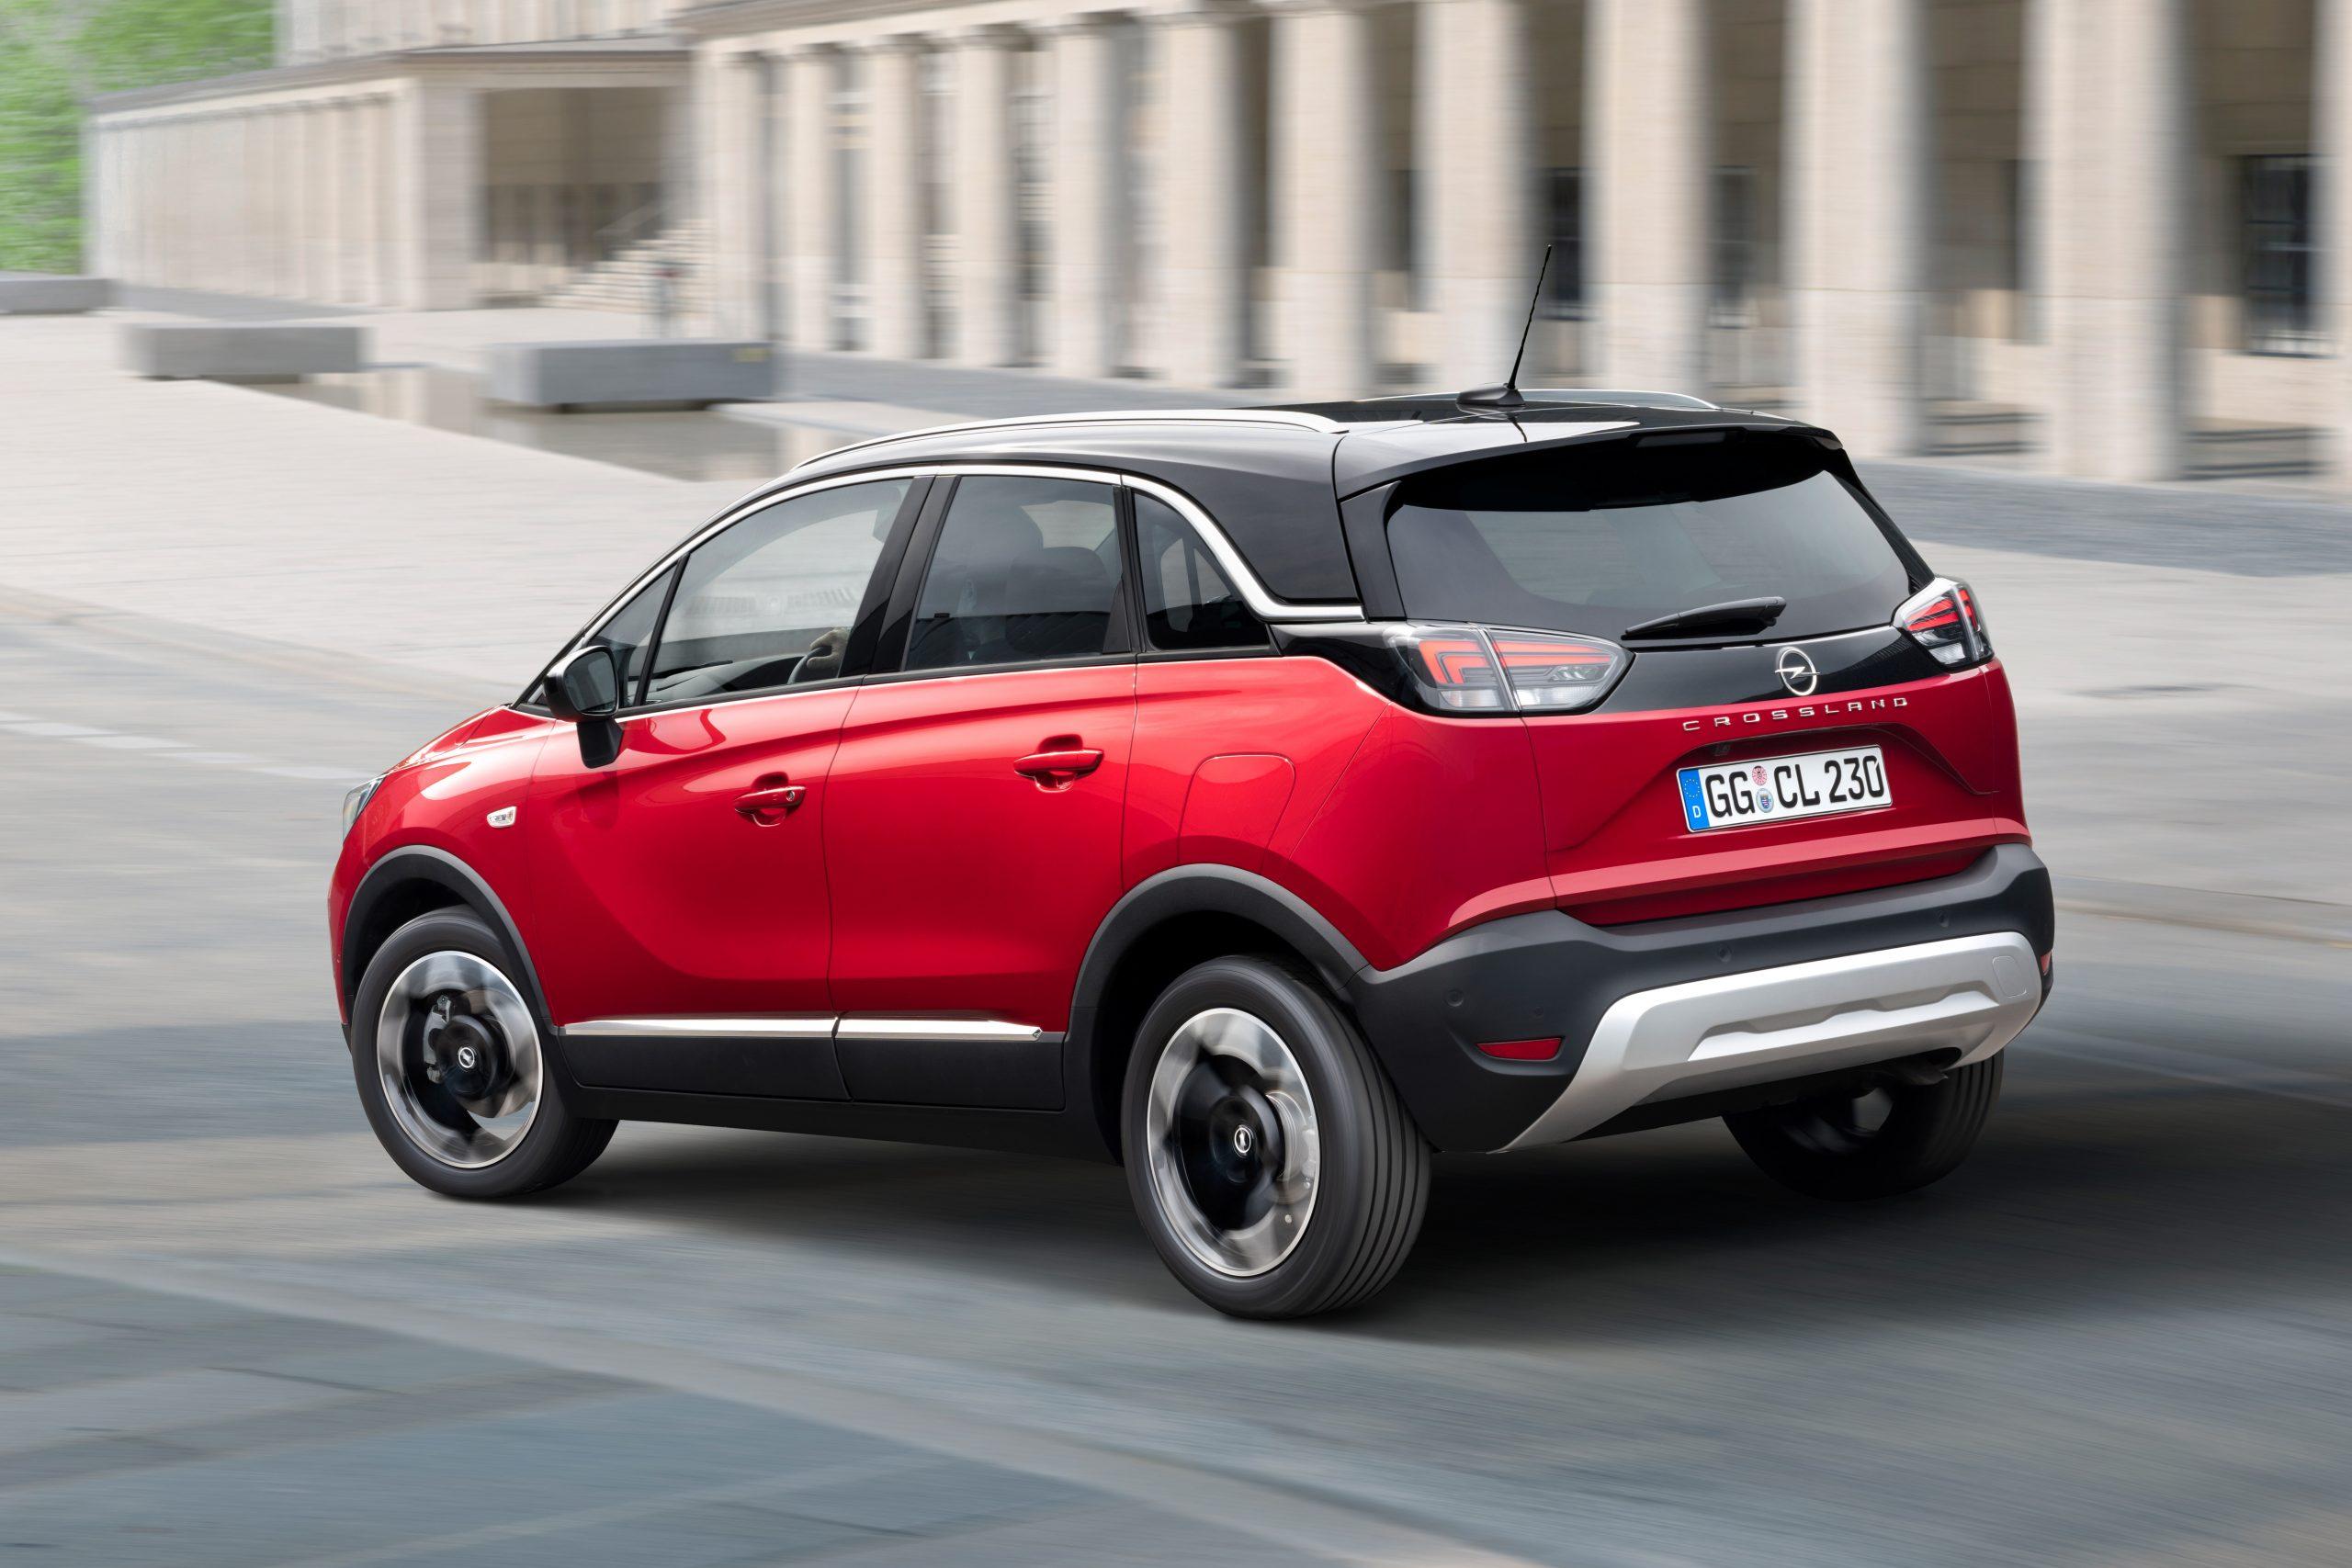 Opel'in yeni yüzü Crossland